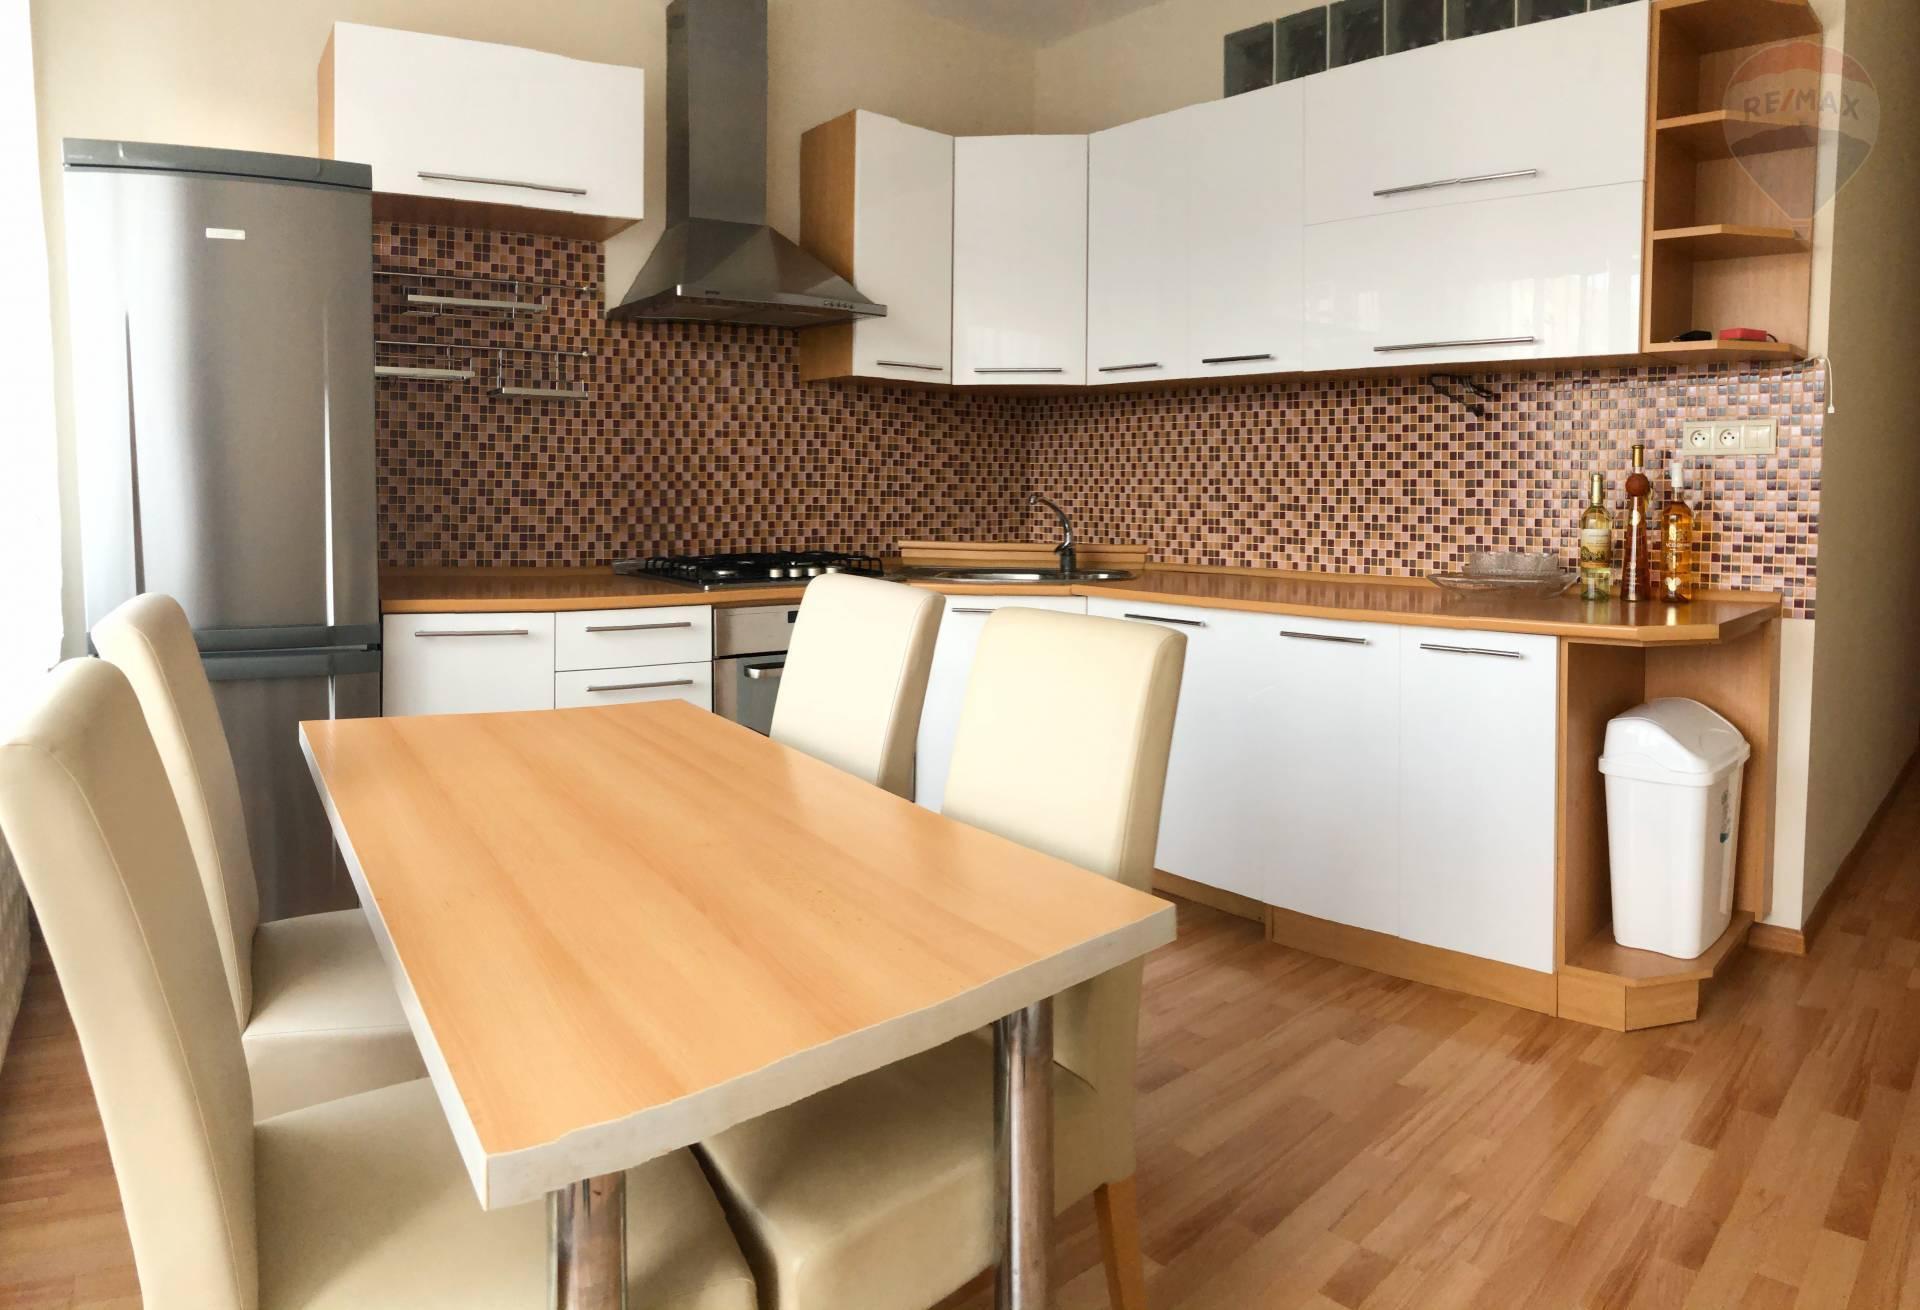 PRENÁJOM: 3-izbový byt 75,6m², Banská Bystrica - Fončorda